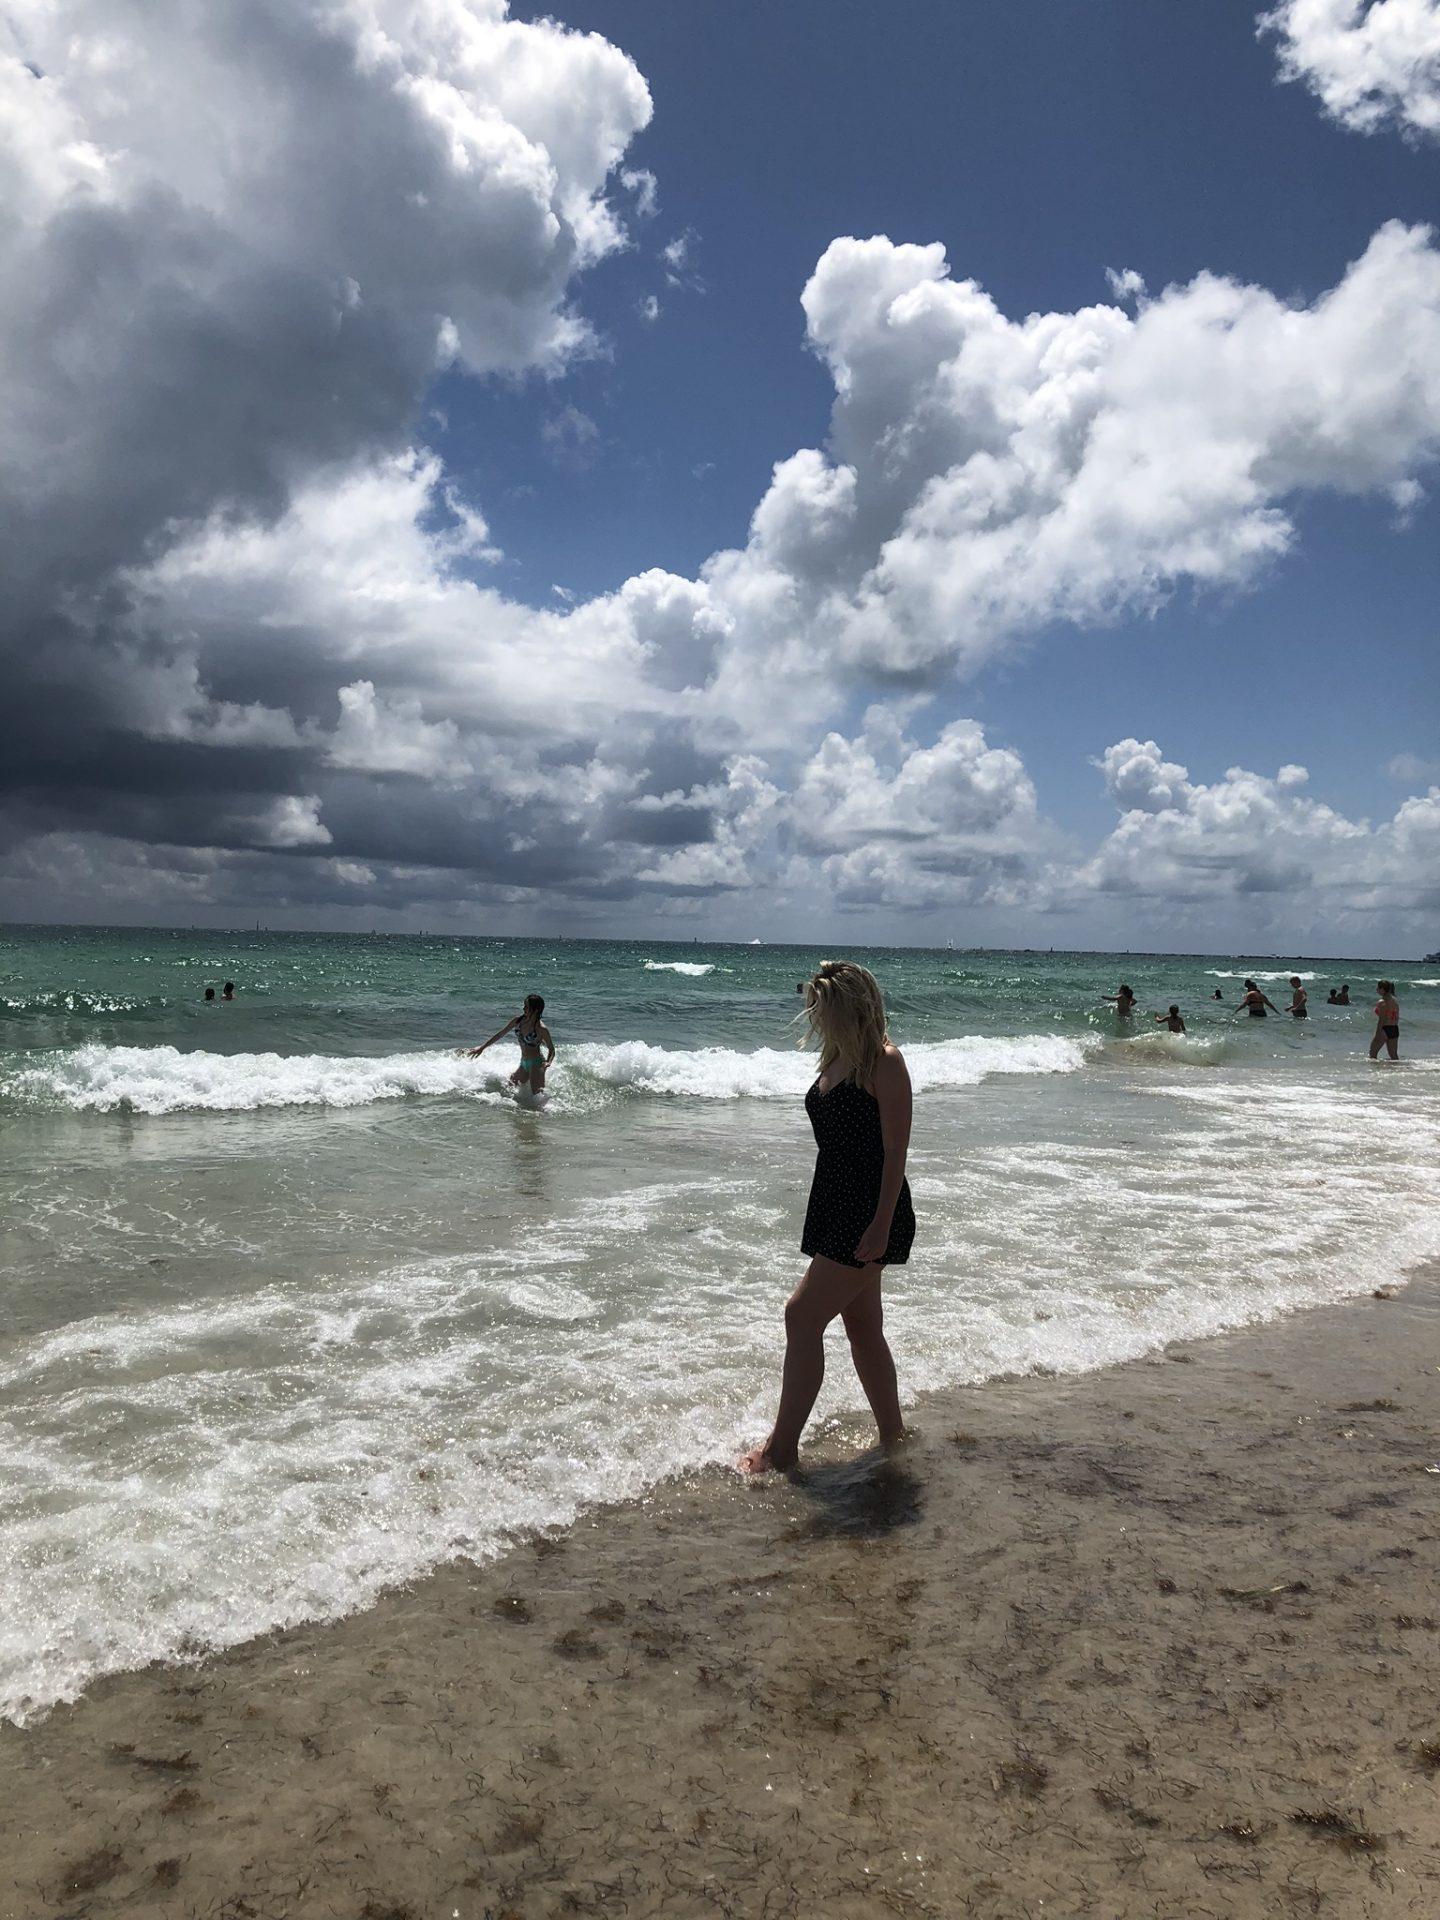 Laura on South Beach, Florida